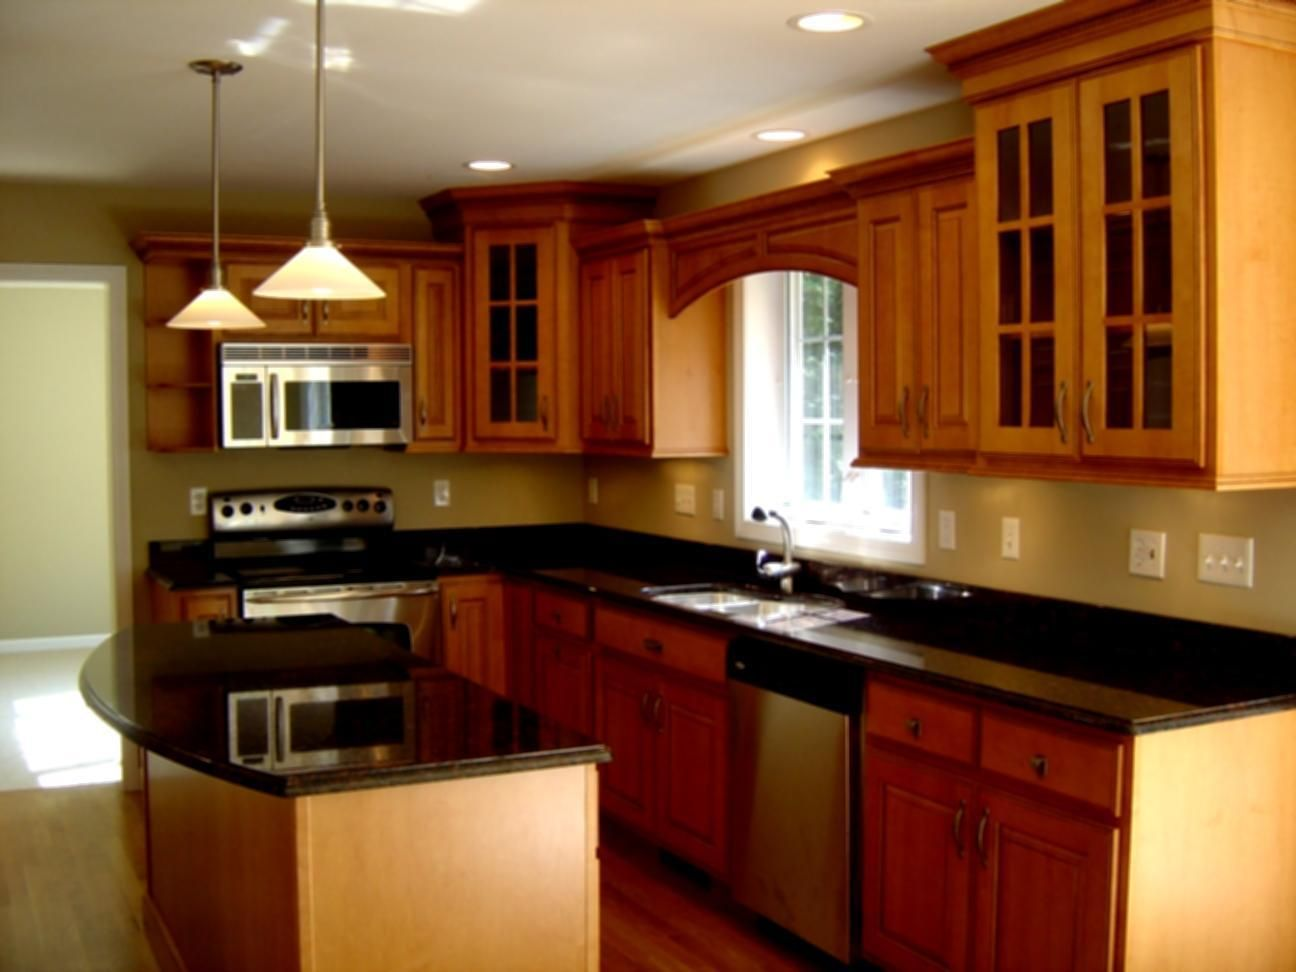 50 minimalist kitchen cabinet simple kitchen design ideas for small space simple kitchen on kitchen ideas simple id=34551